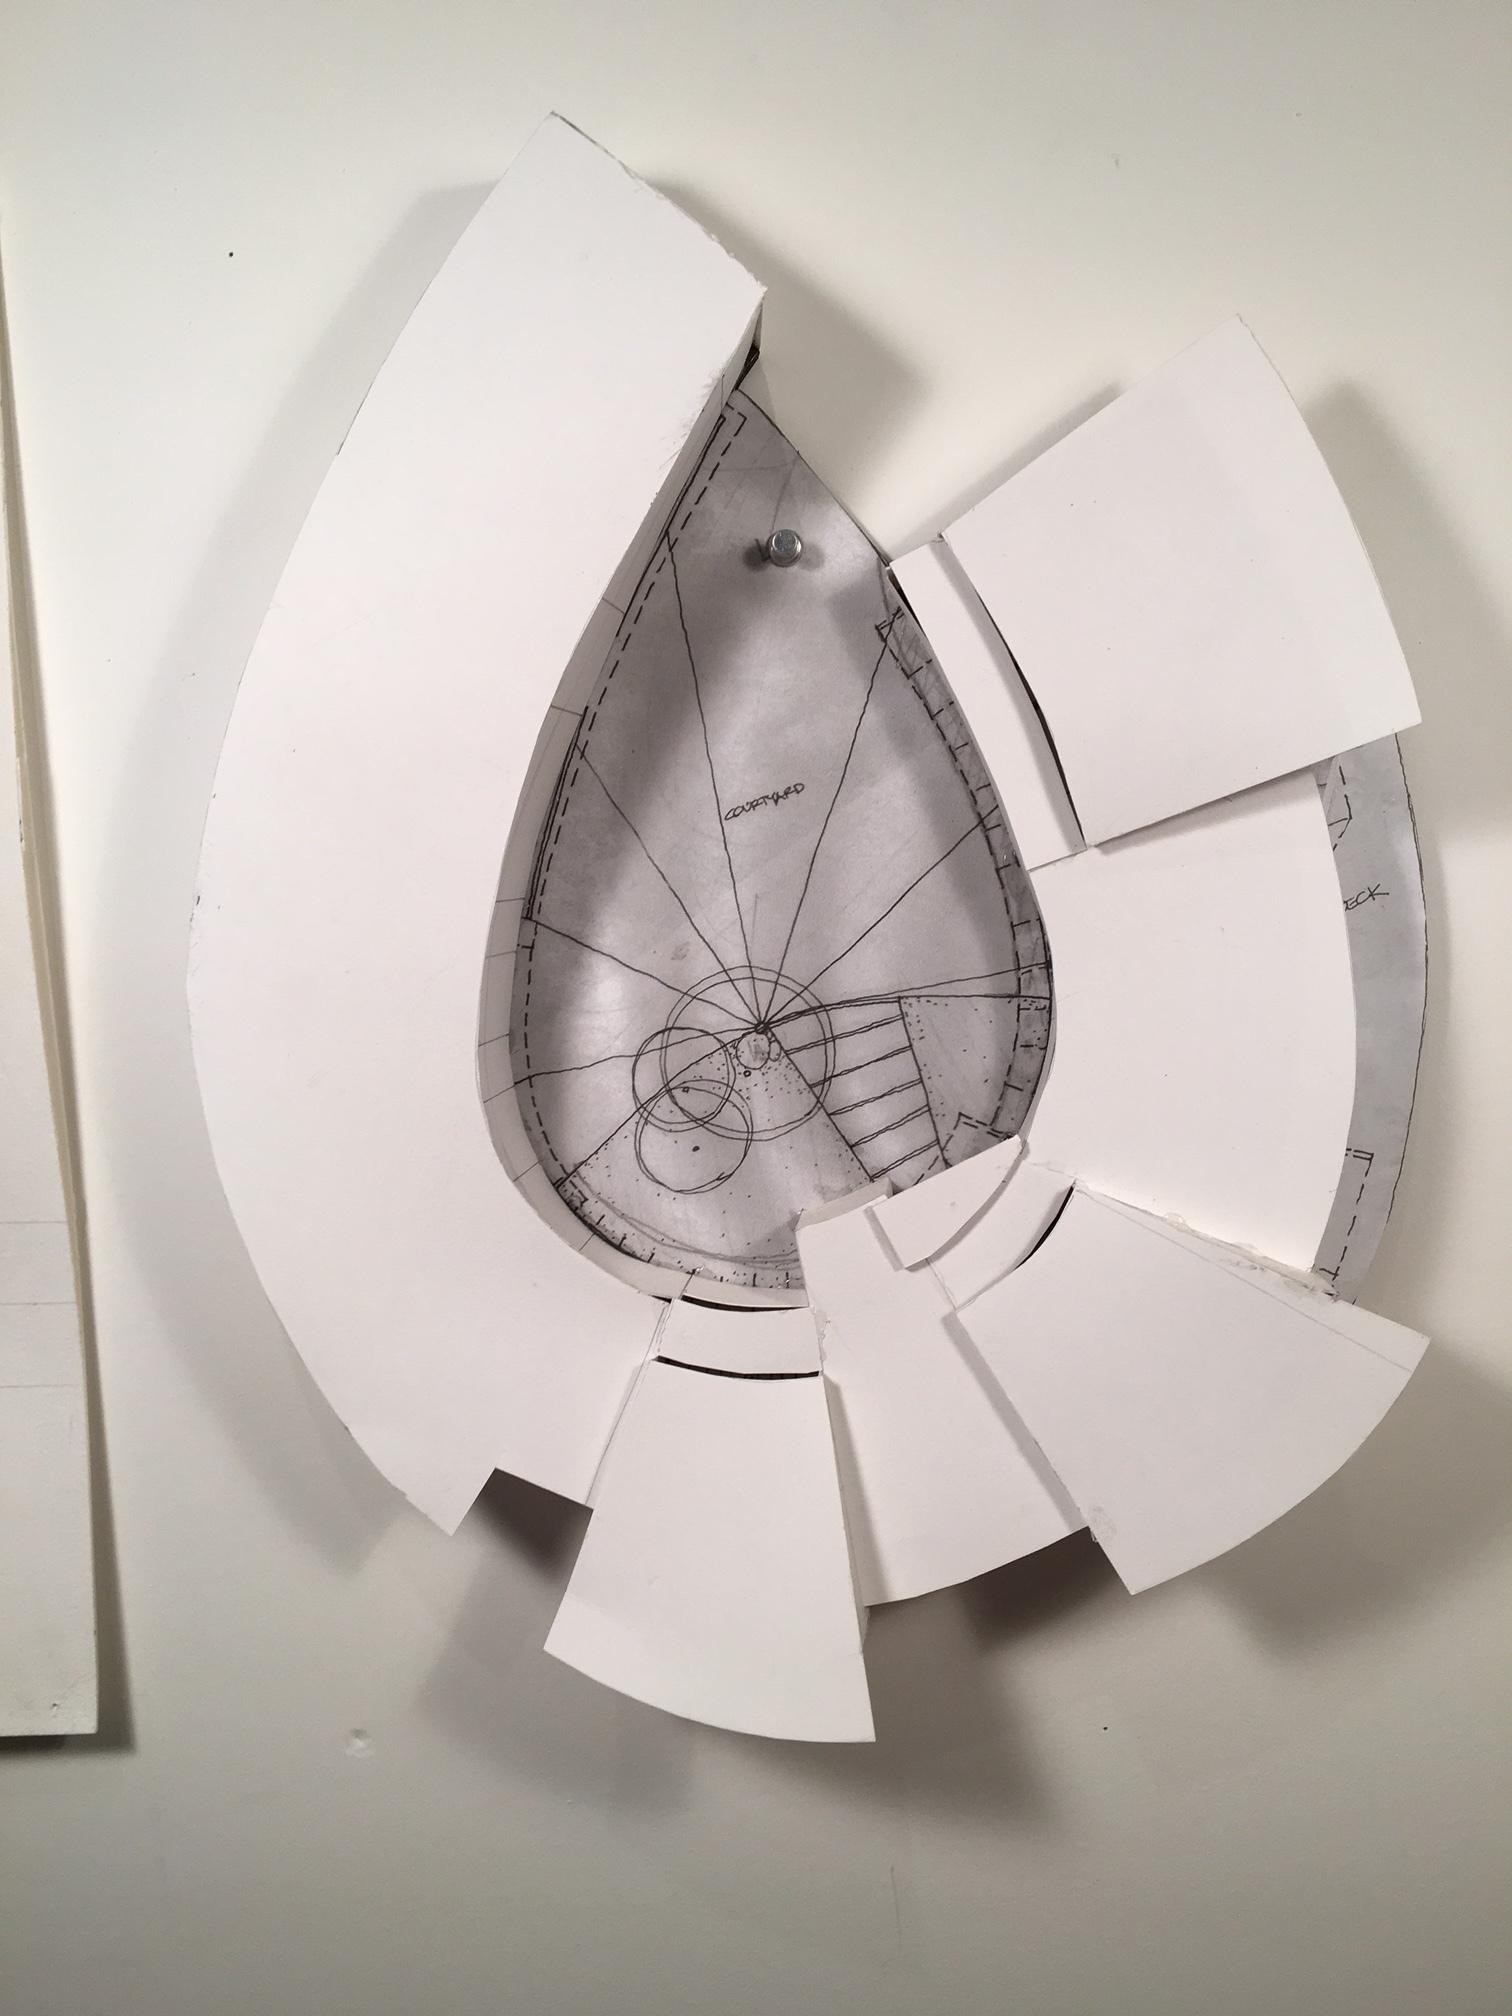 th02 Making models